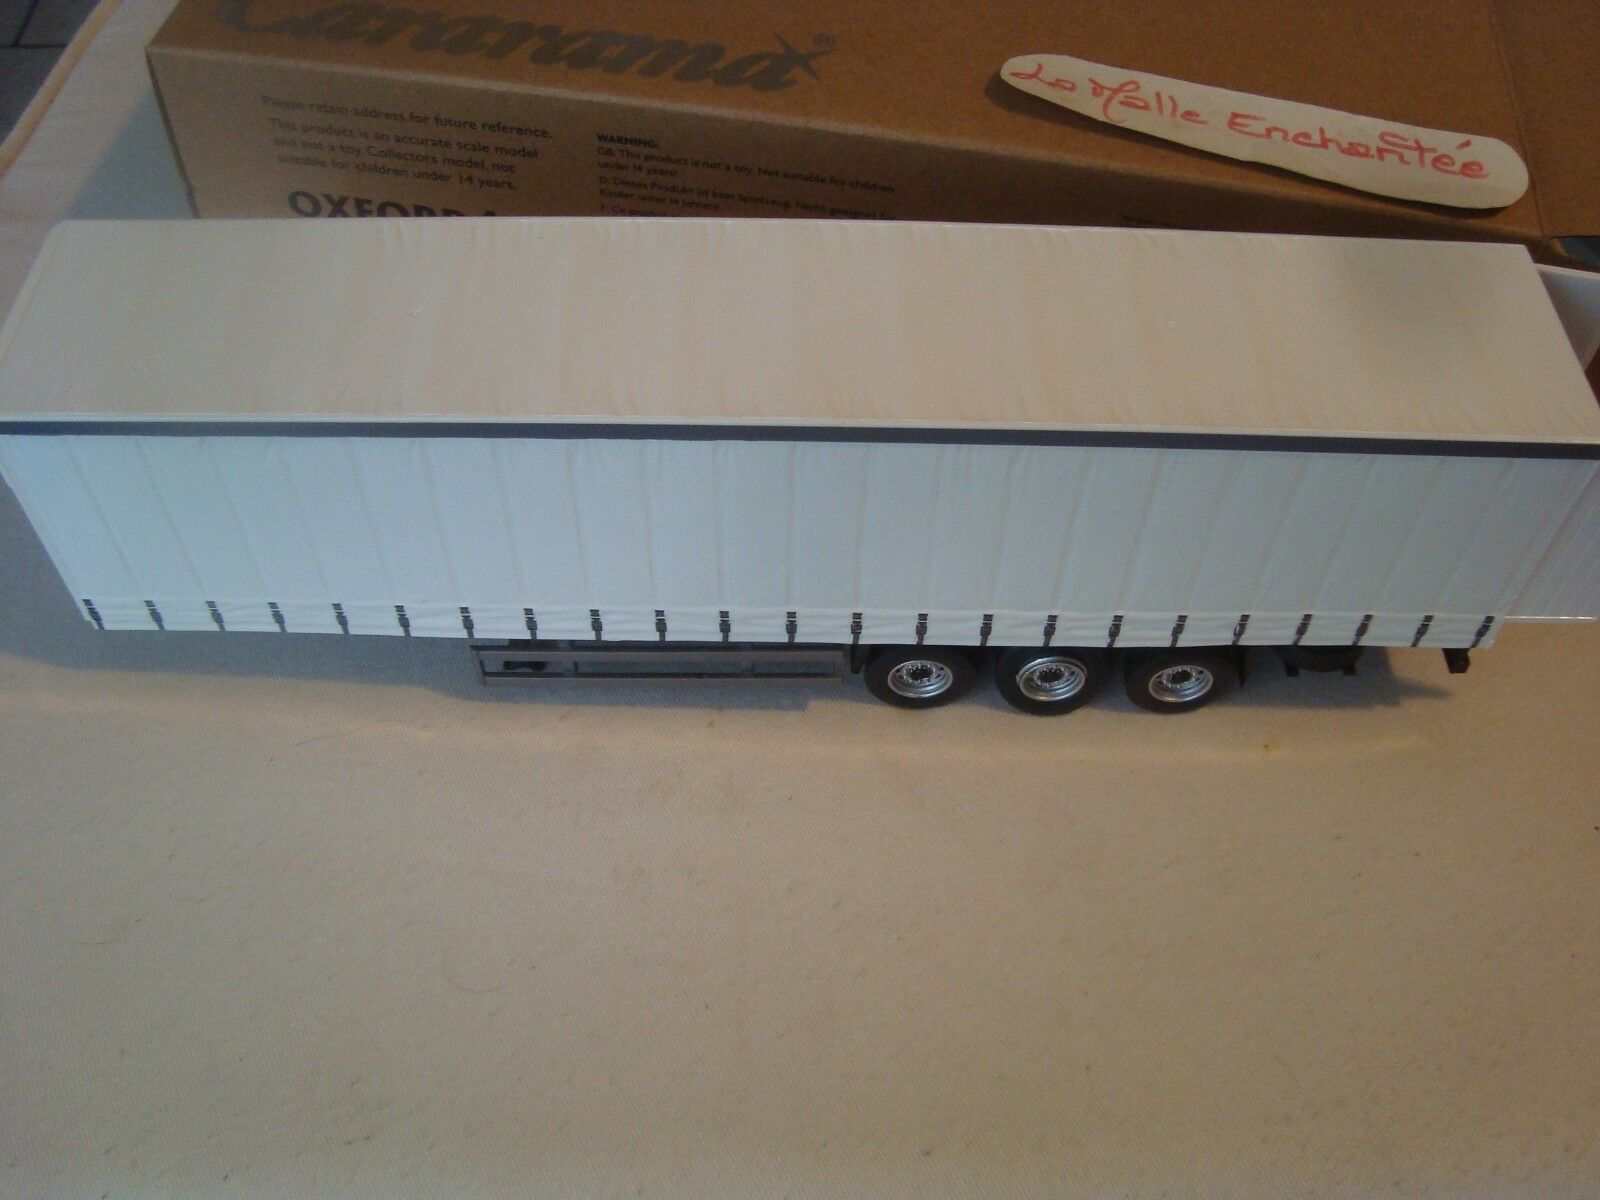 Oxford Diecast 1:50 CR027 CARARAMA moderne 3 Essieu Curtainside Trailer Blanc